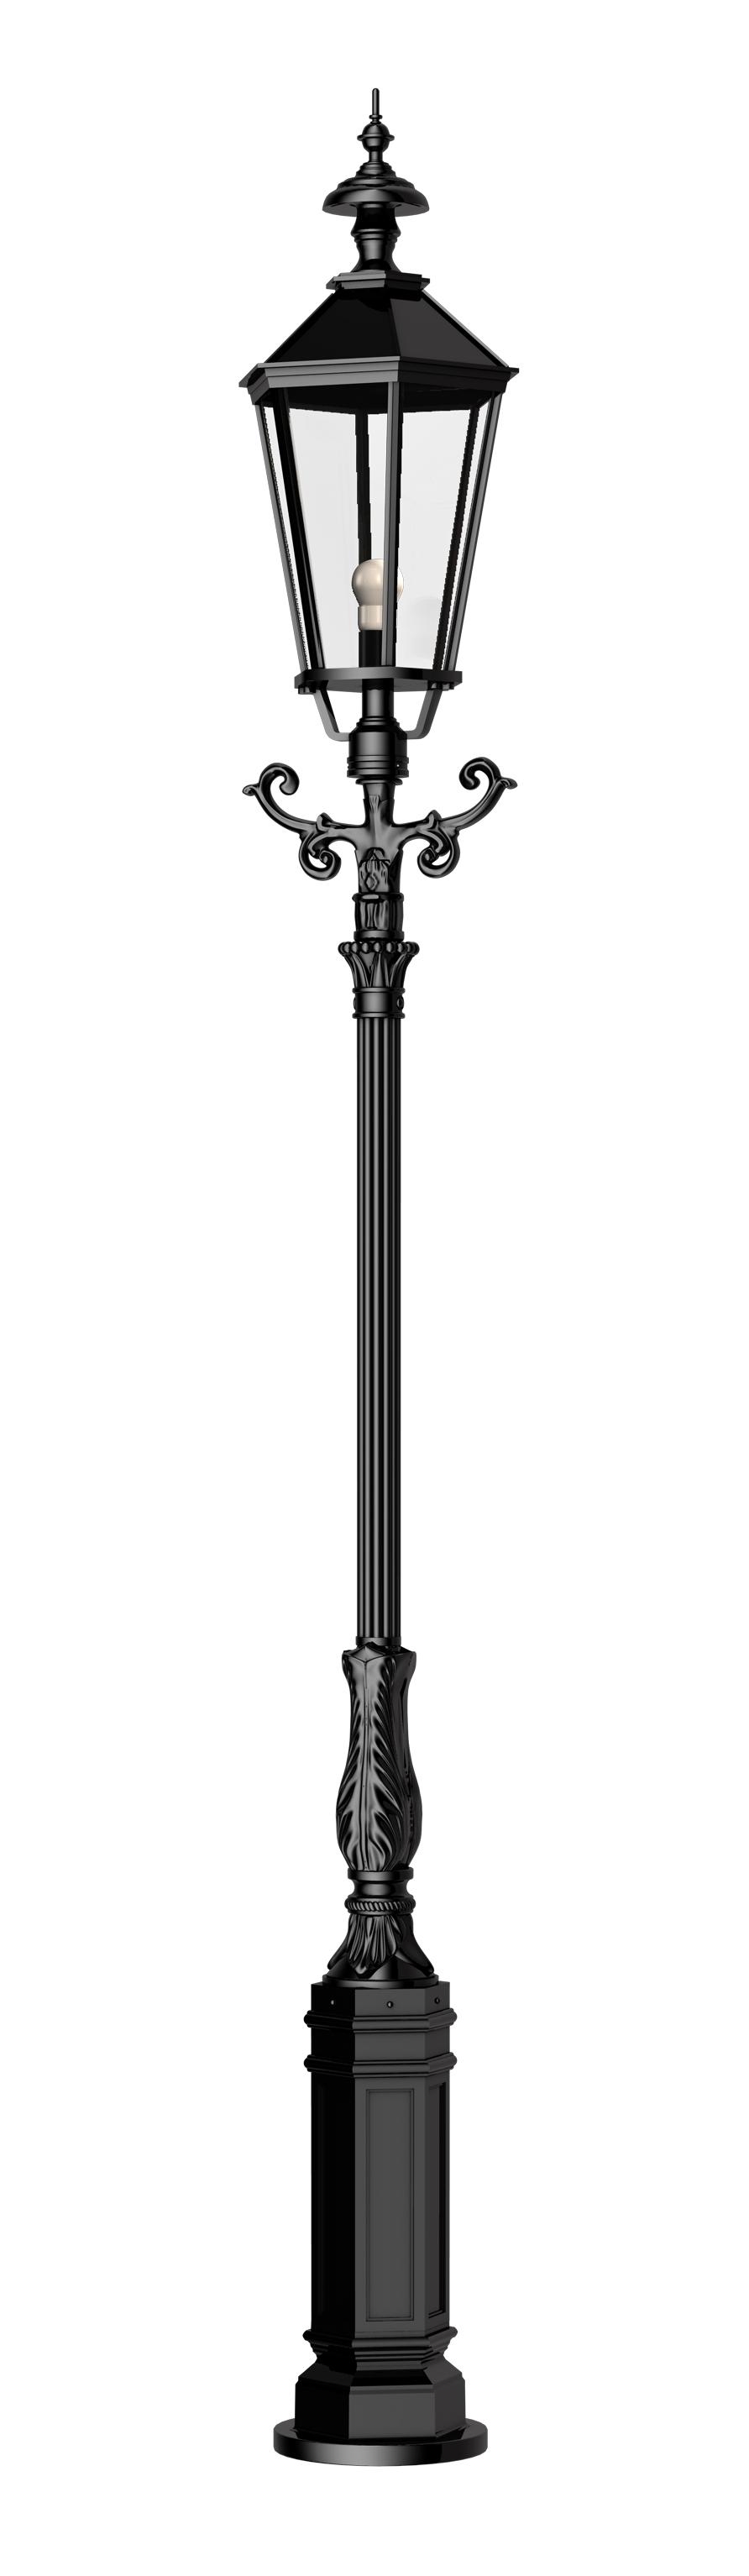 70-1822-323